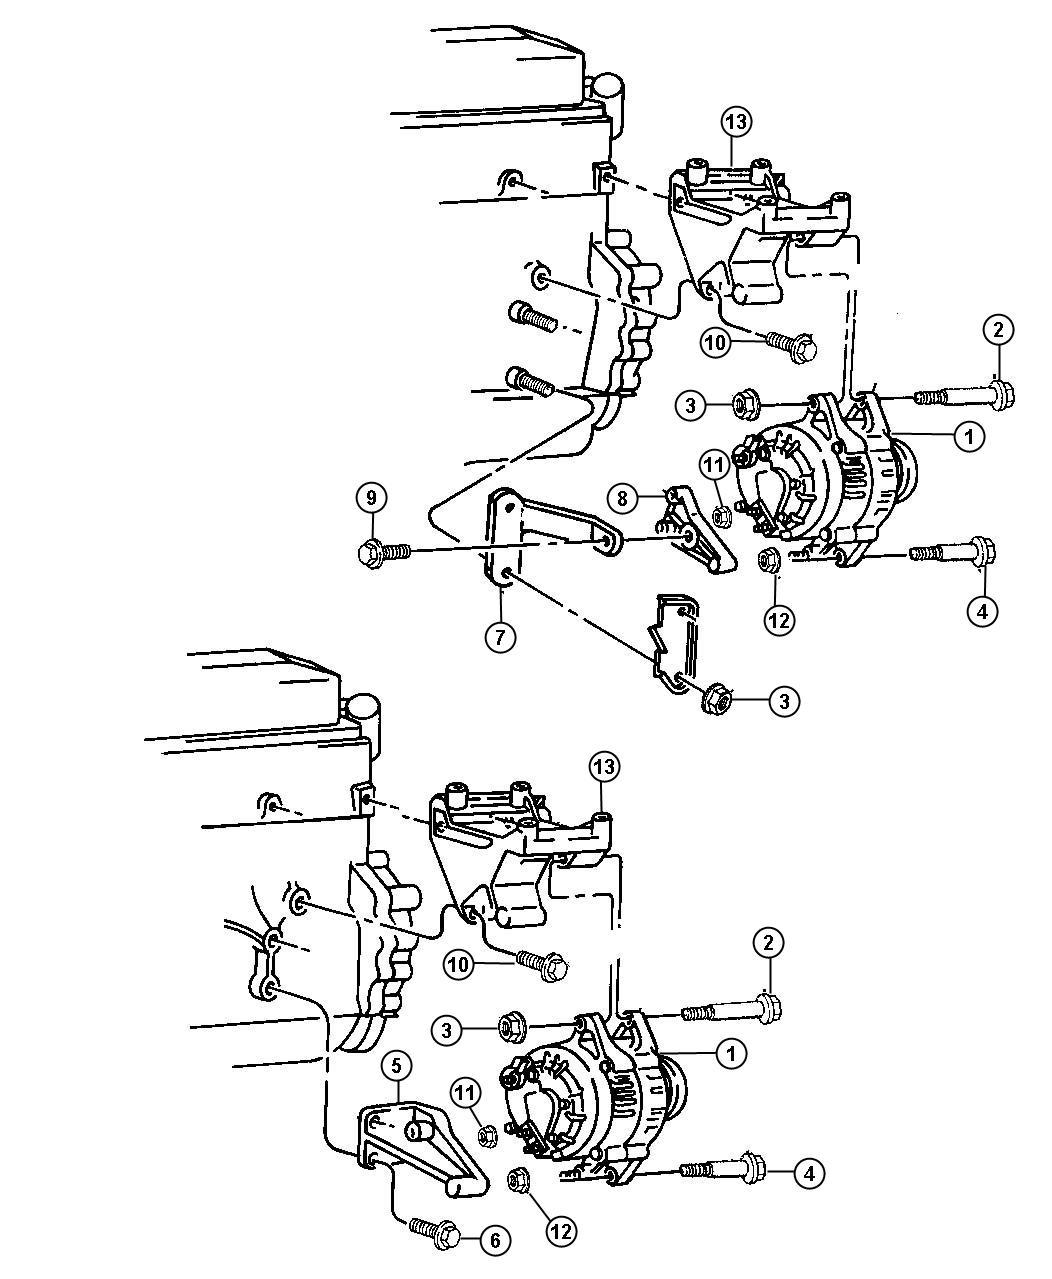 1995 Jeep wrangler alternator bracket